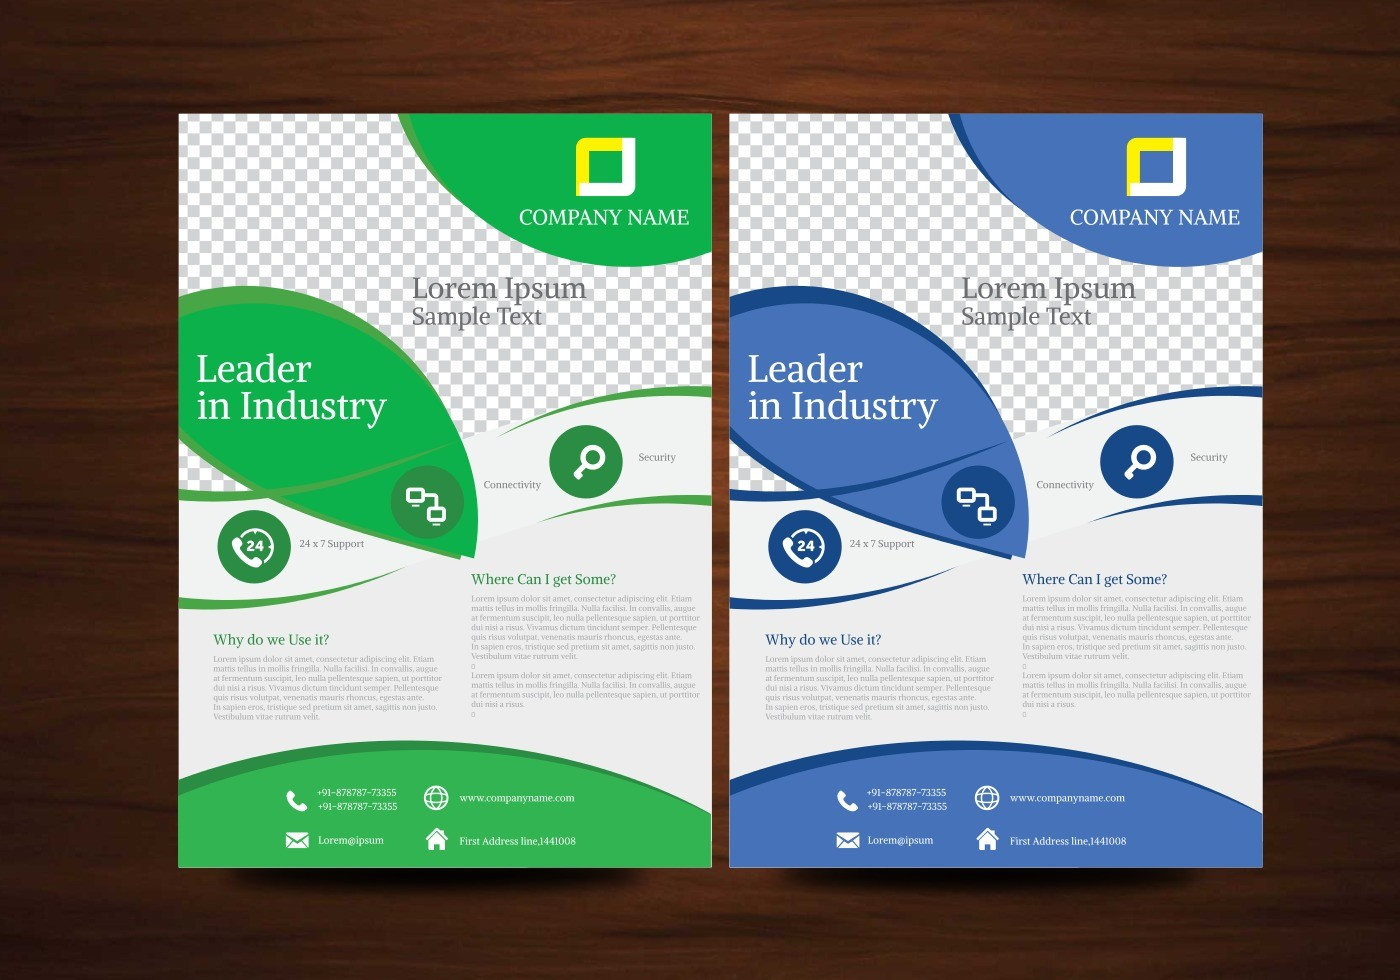 flyer template design  Blue and Green Vector Brochure Flyer Design Template ..